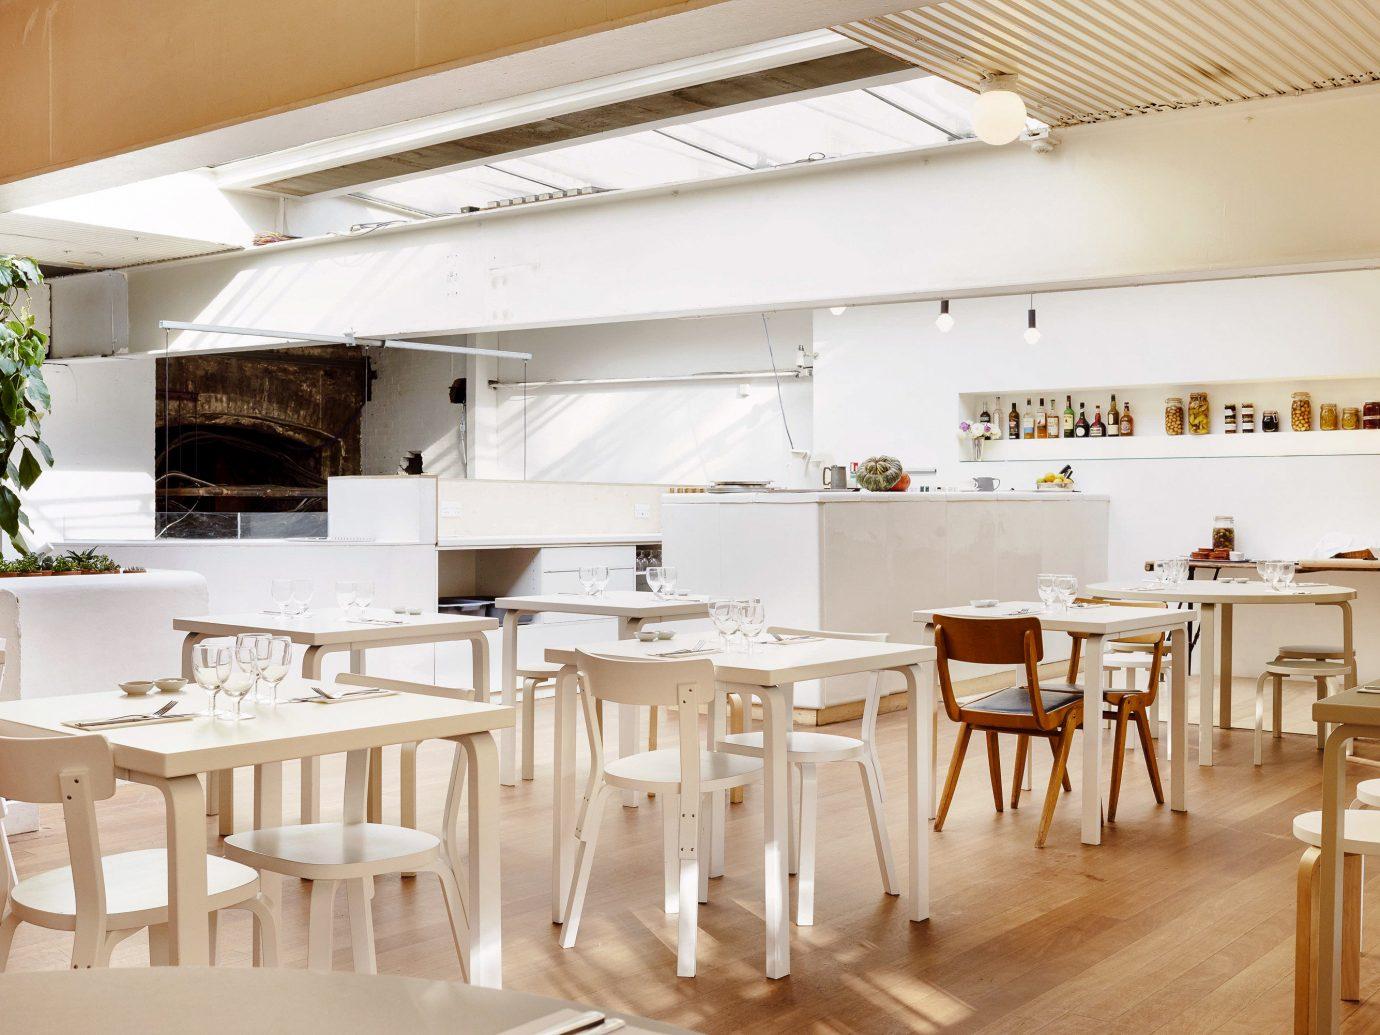 Food + Drink London floor indoor table ceiling chair room Dining interior design furniture restaurant wooden product design café interior designer loft wood area